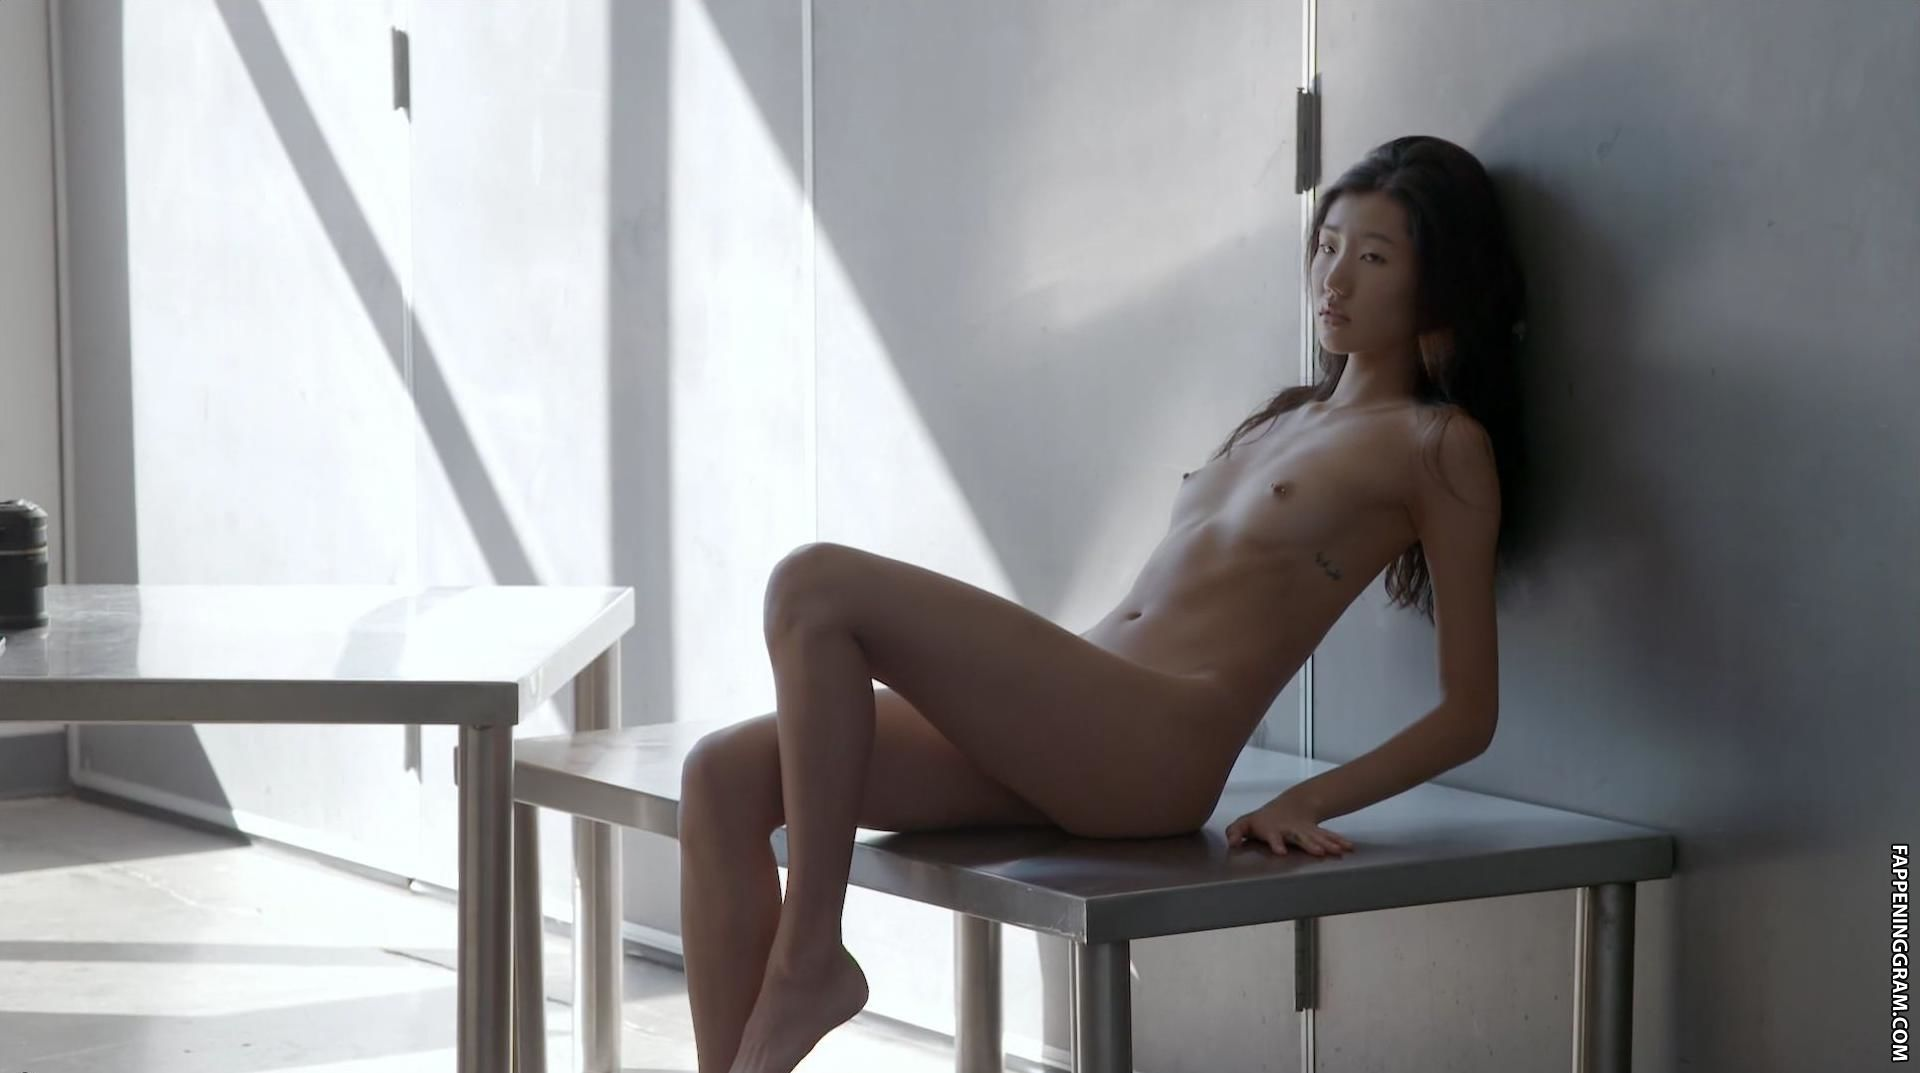 Laredo  nackt Elizabeth elizabeth nacktbilder